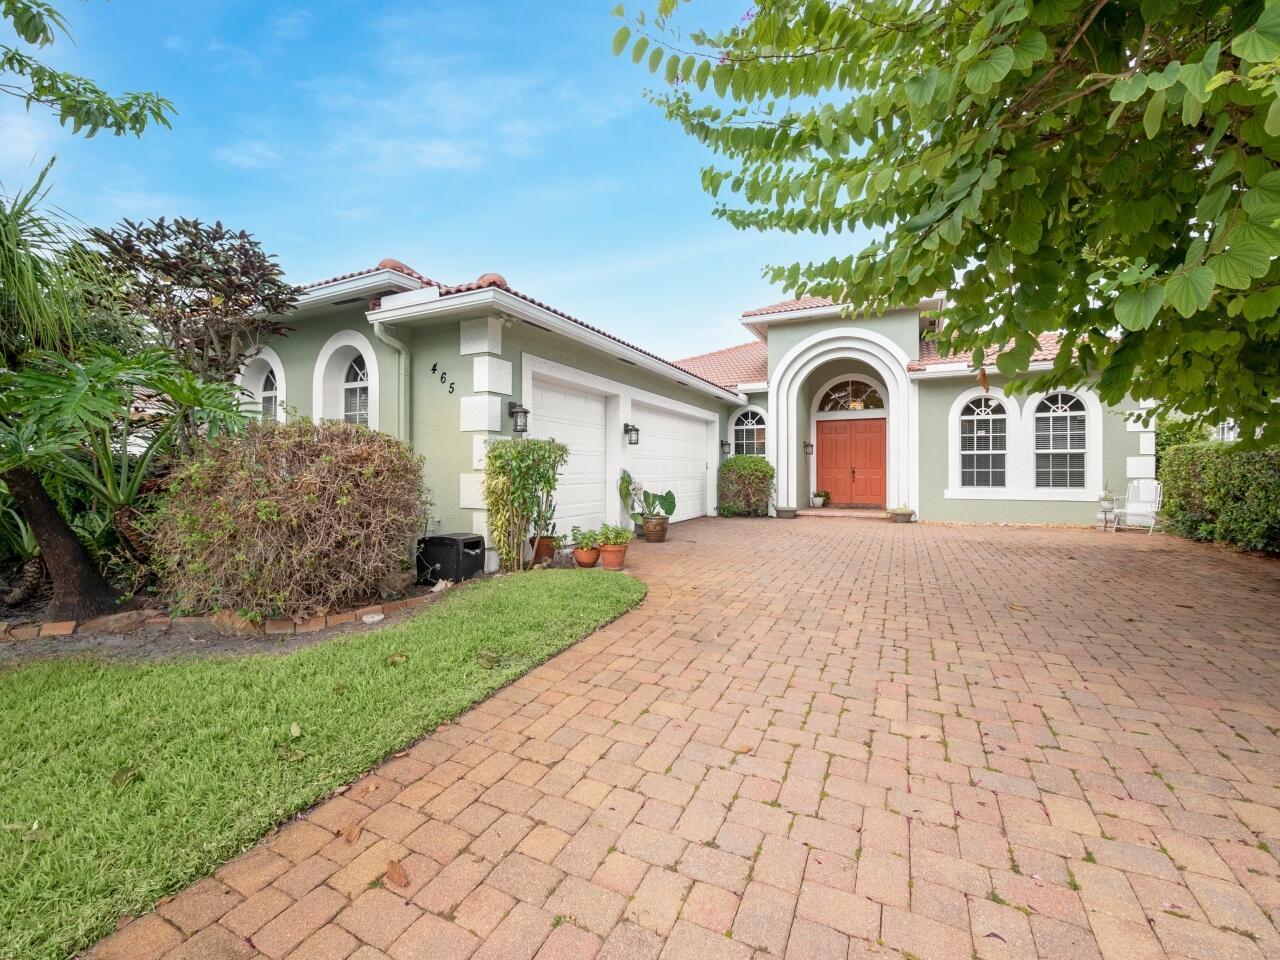 465 Pine Tree Court, Atlantis, FL 33462